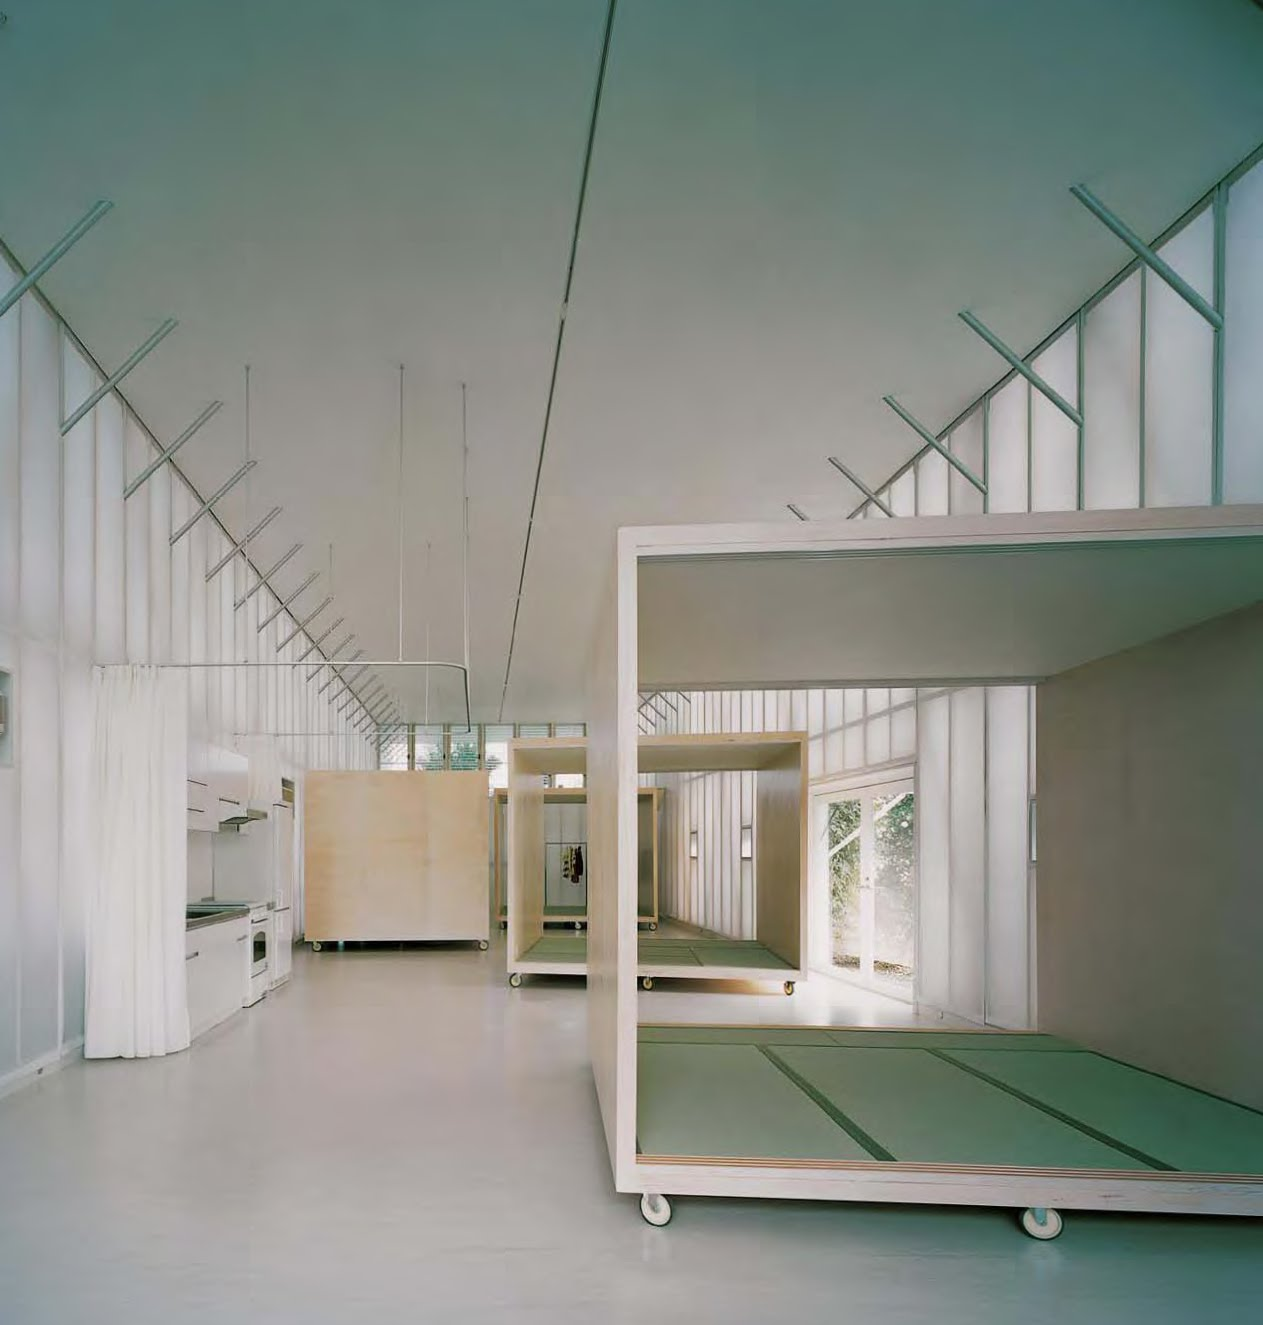 Architecture interior design naked house saitama for Architecture ephemere shigeru ban